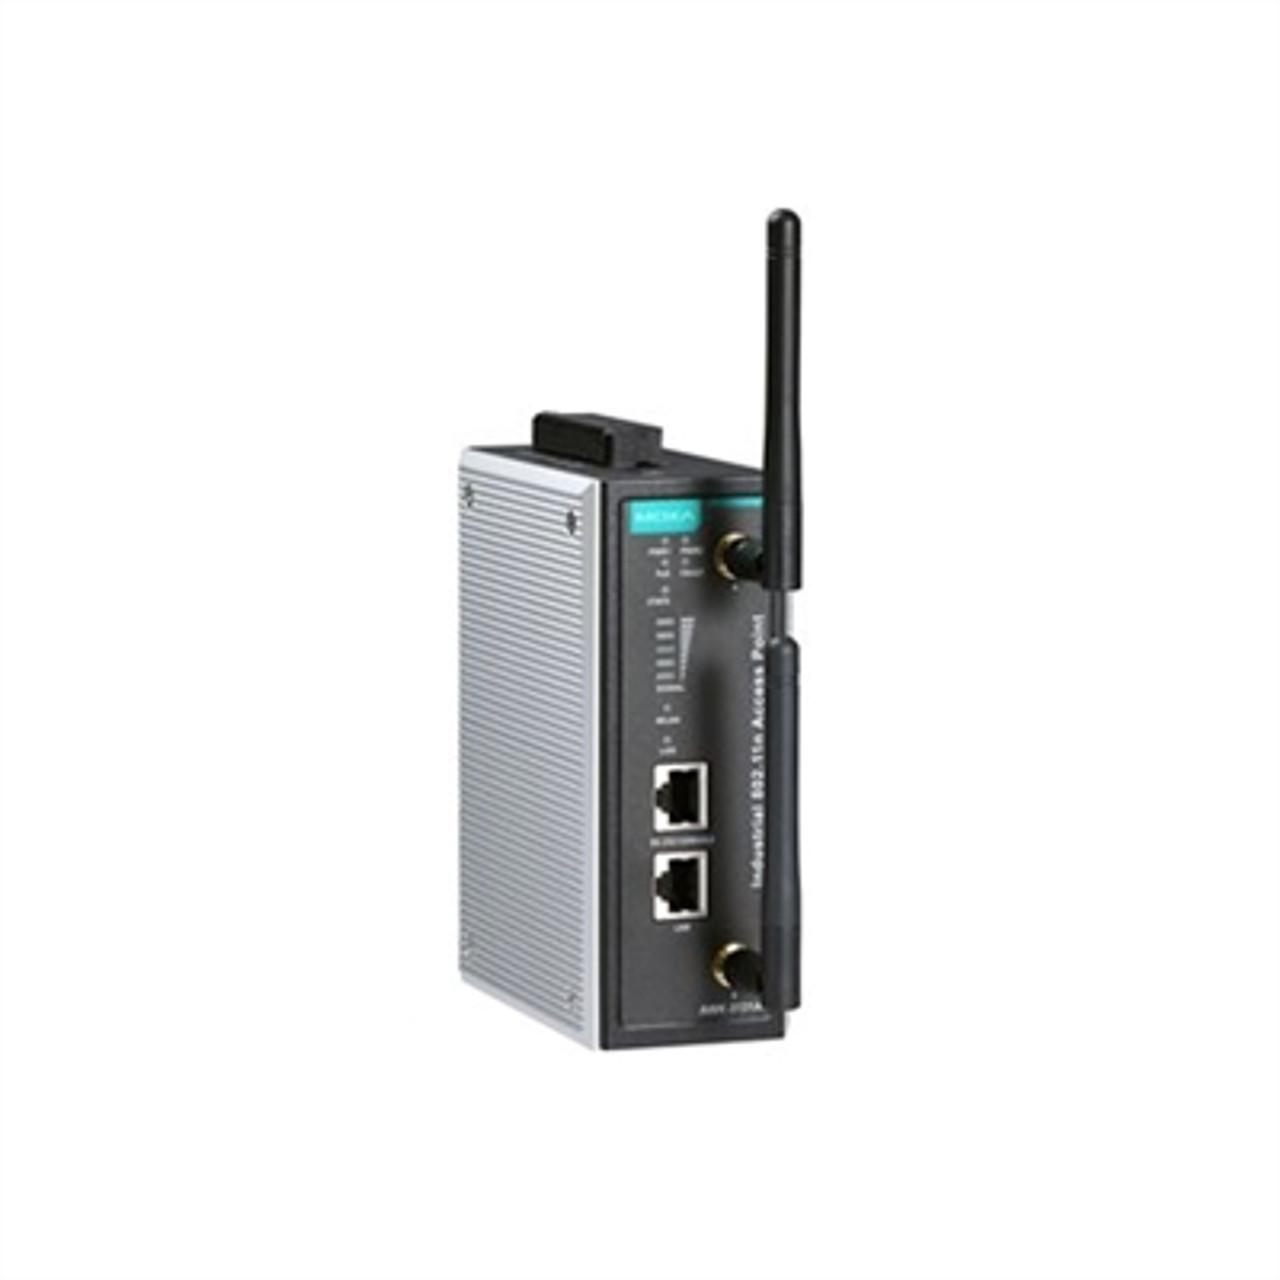 Moxa AWK-3131A-EU Industrial Access Point